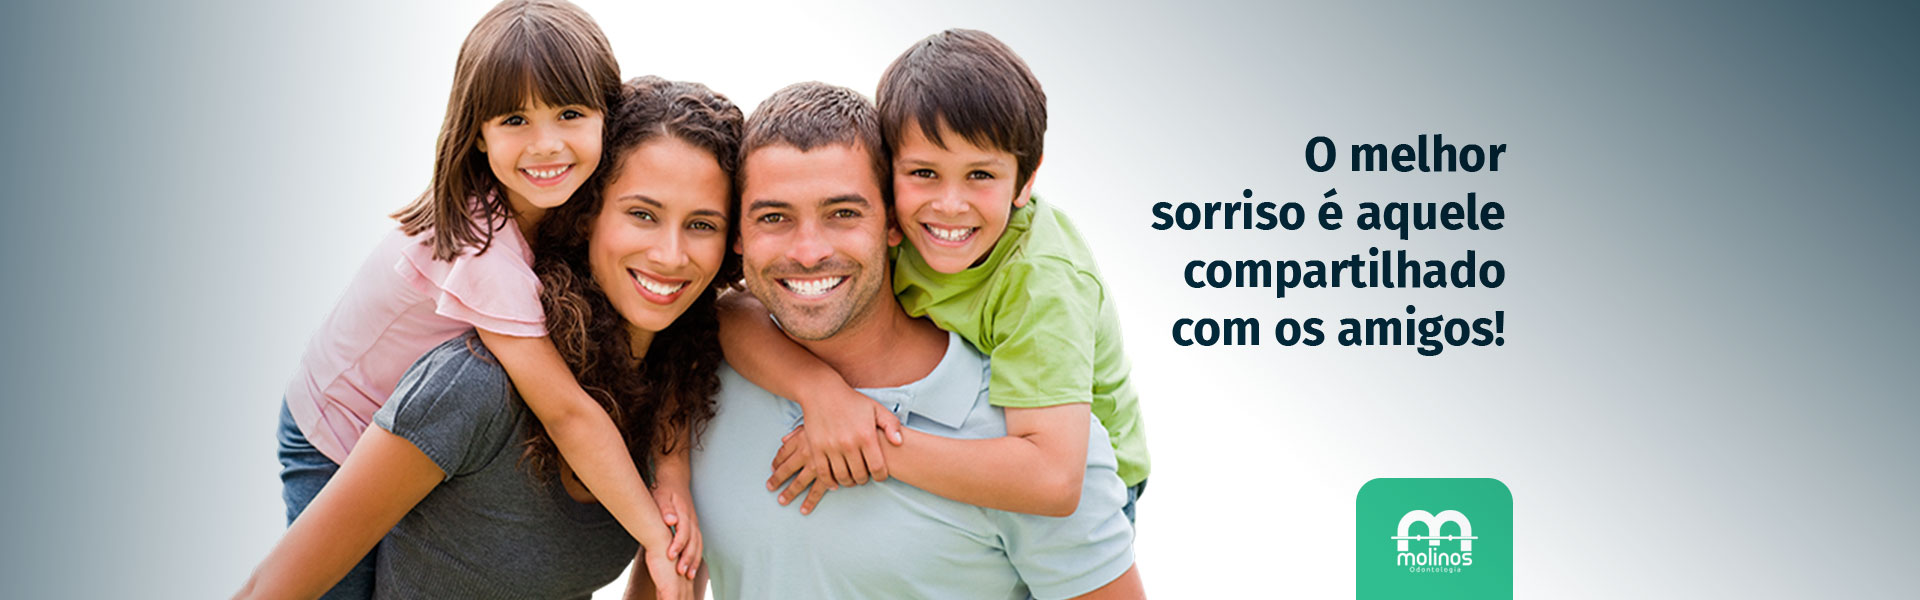 Início - Molinos Odontologia - image banner-1 on https://molinosodontologia.com.br